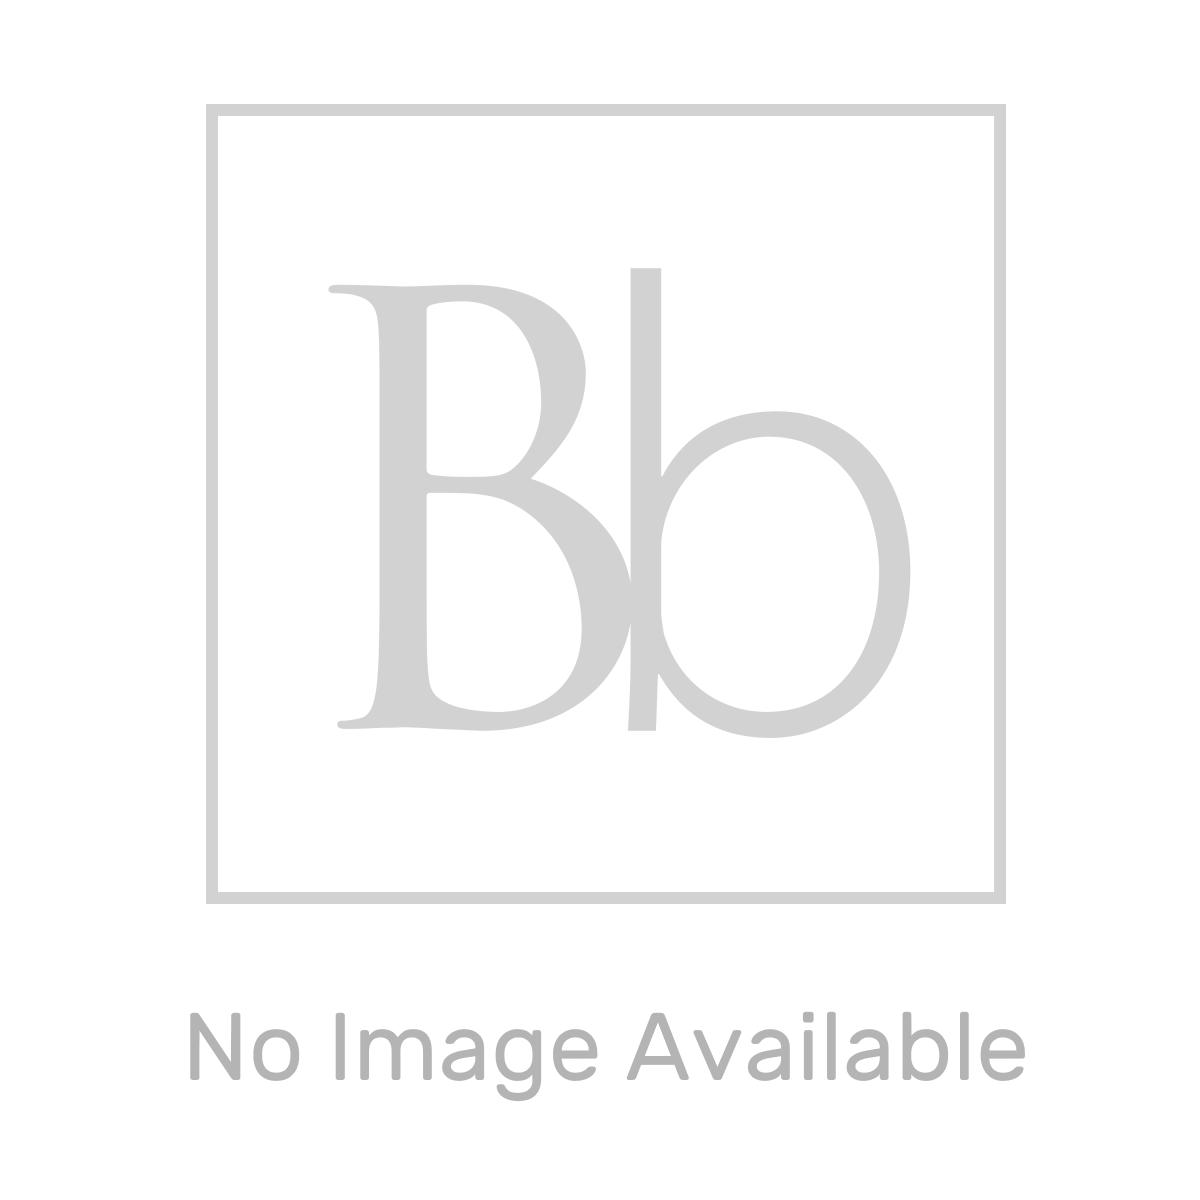 Merlyn MStone Offset Quadrant Shower Tray Panel Set 1200 x 900mm